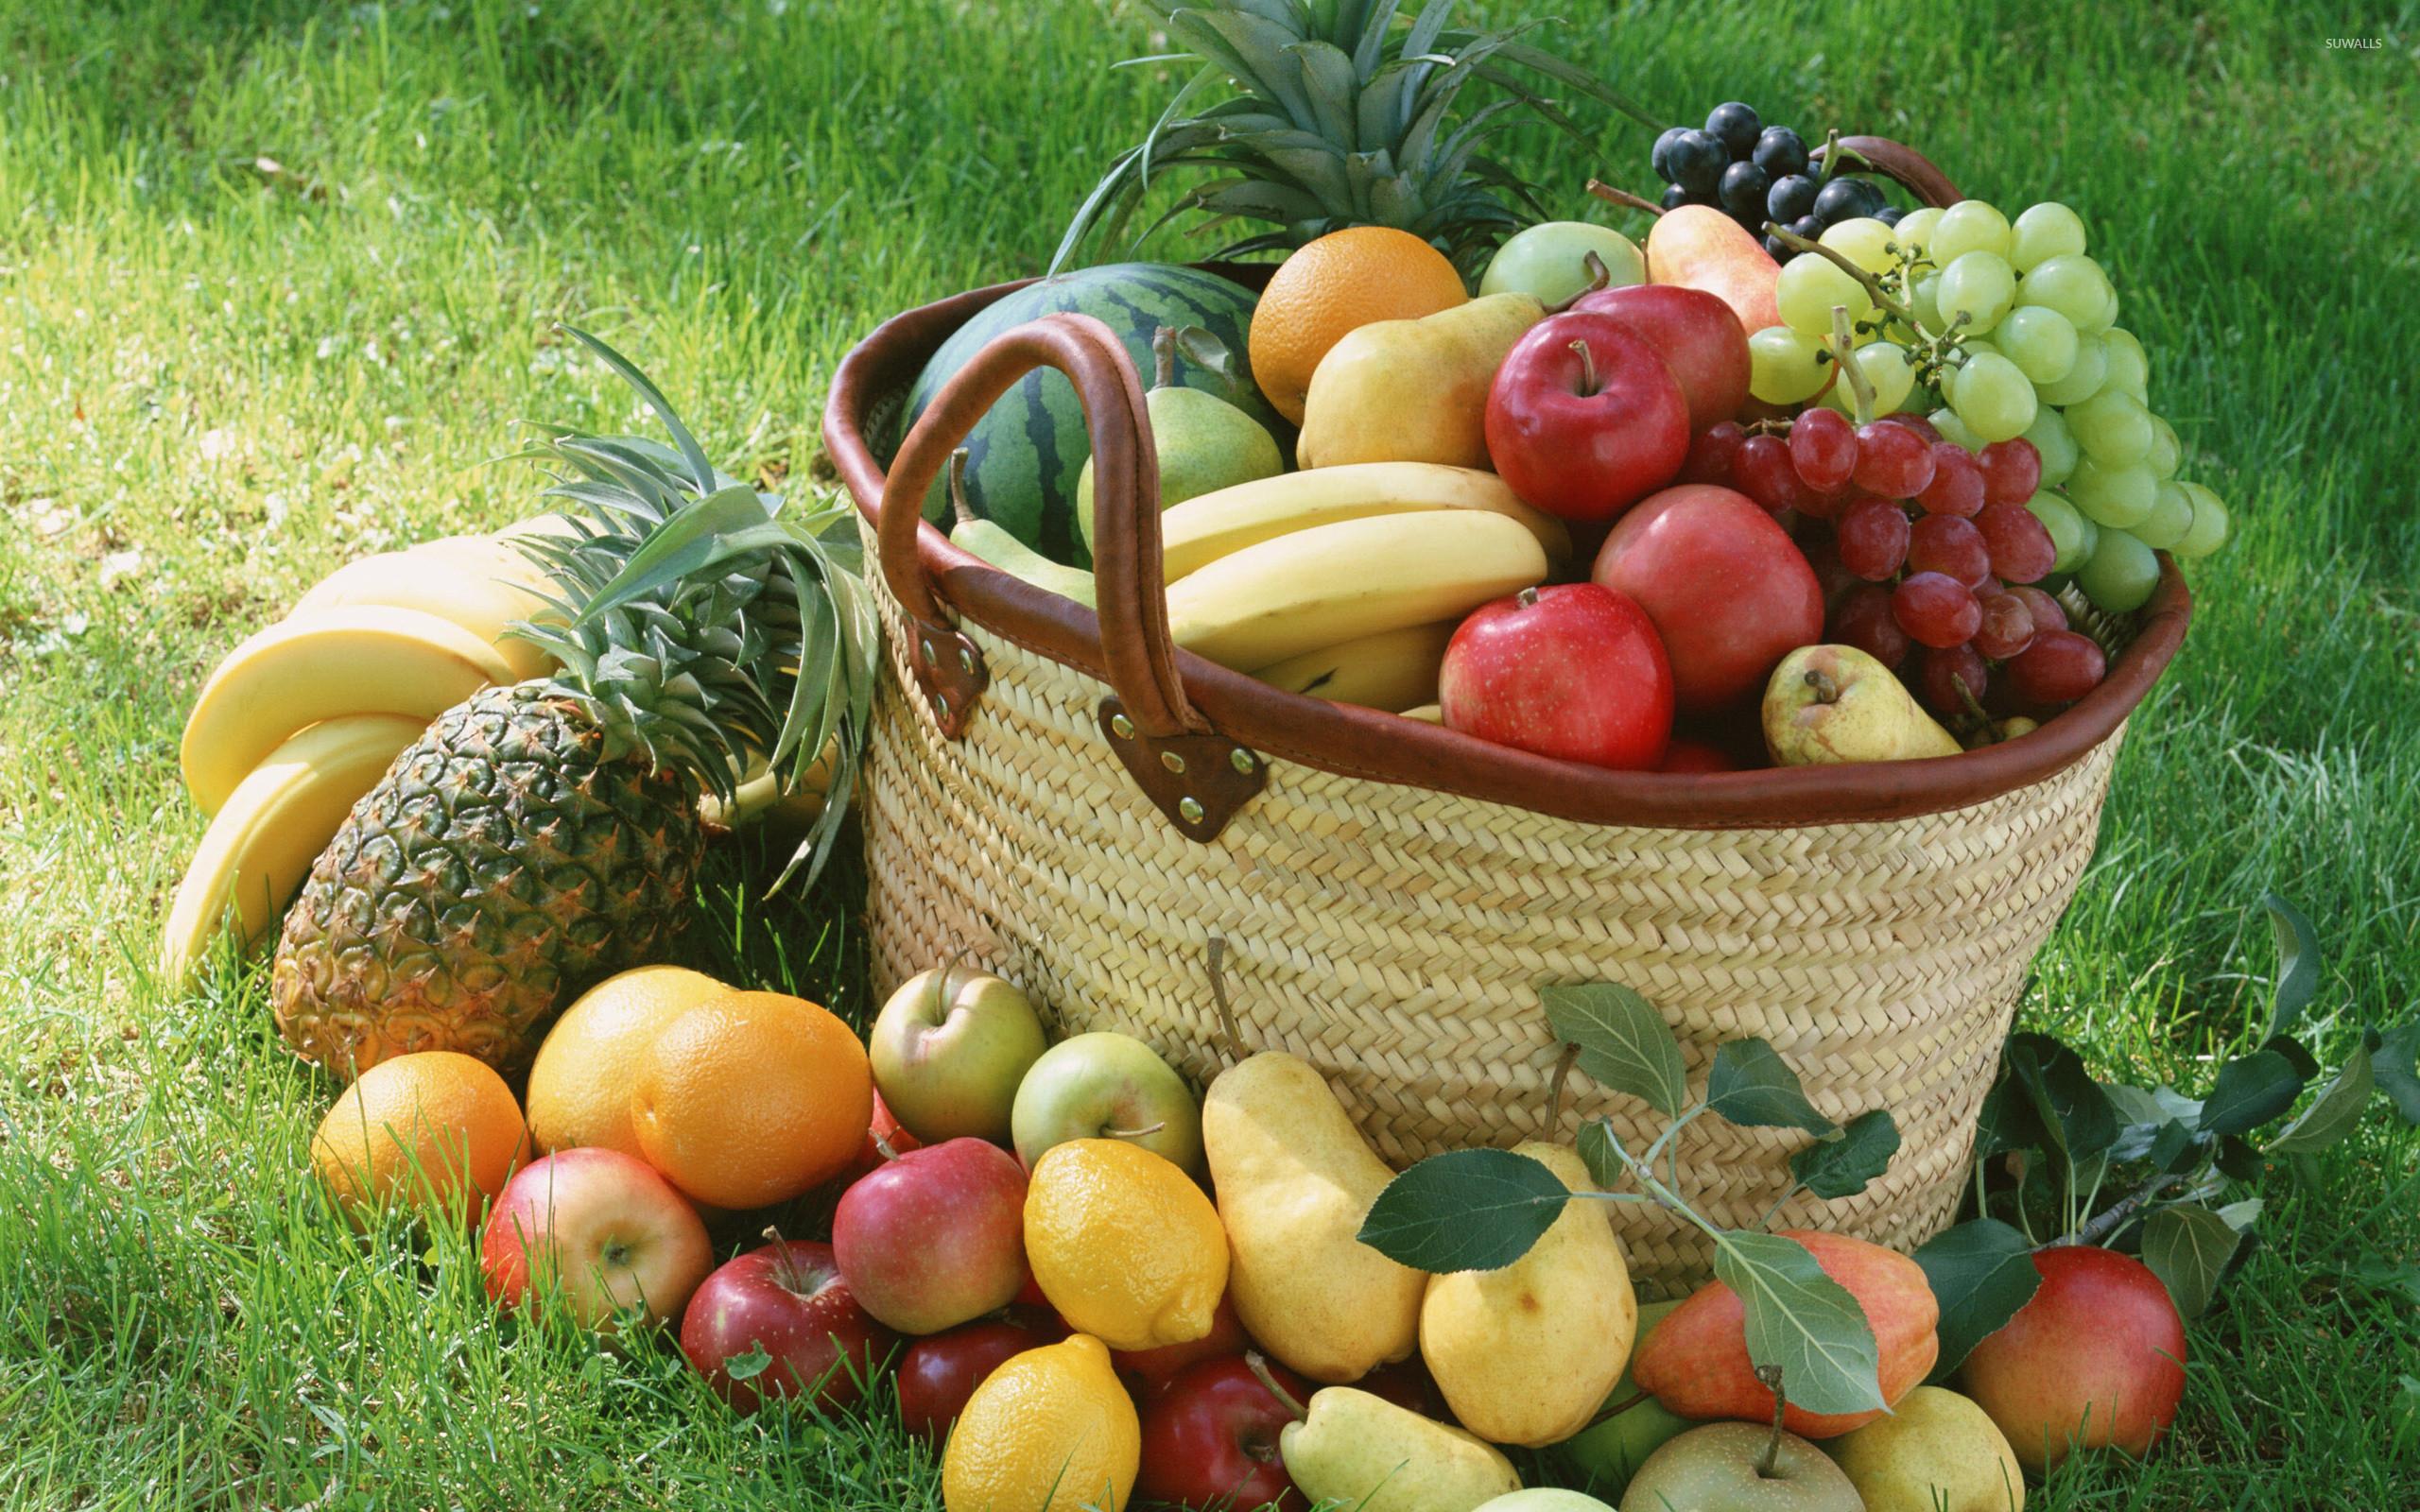 59 Fruit Basket Wallpapers on WallpaperPlay 2560x1600